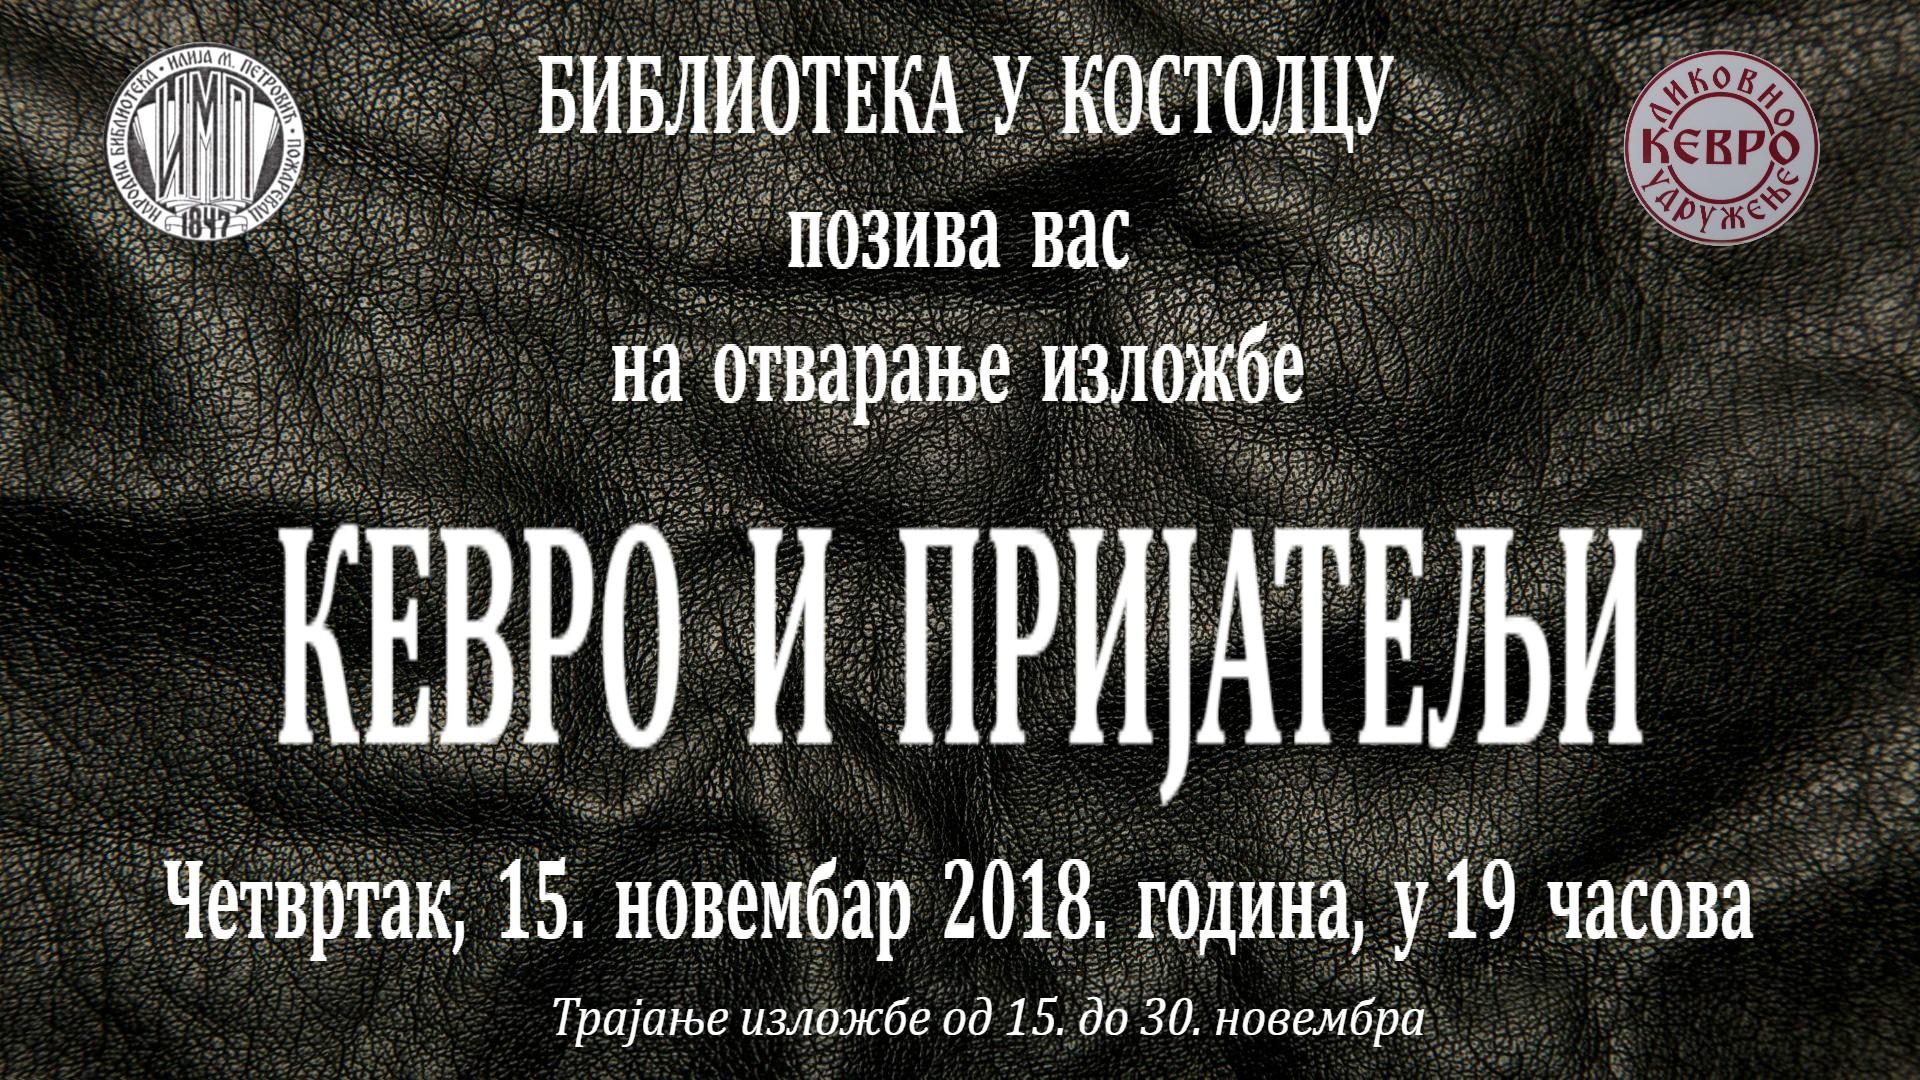 "Veče epske fantastike i izložba slika ""Kevro i prijatelji"" u Biblioteci u Kostolcu 10834"